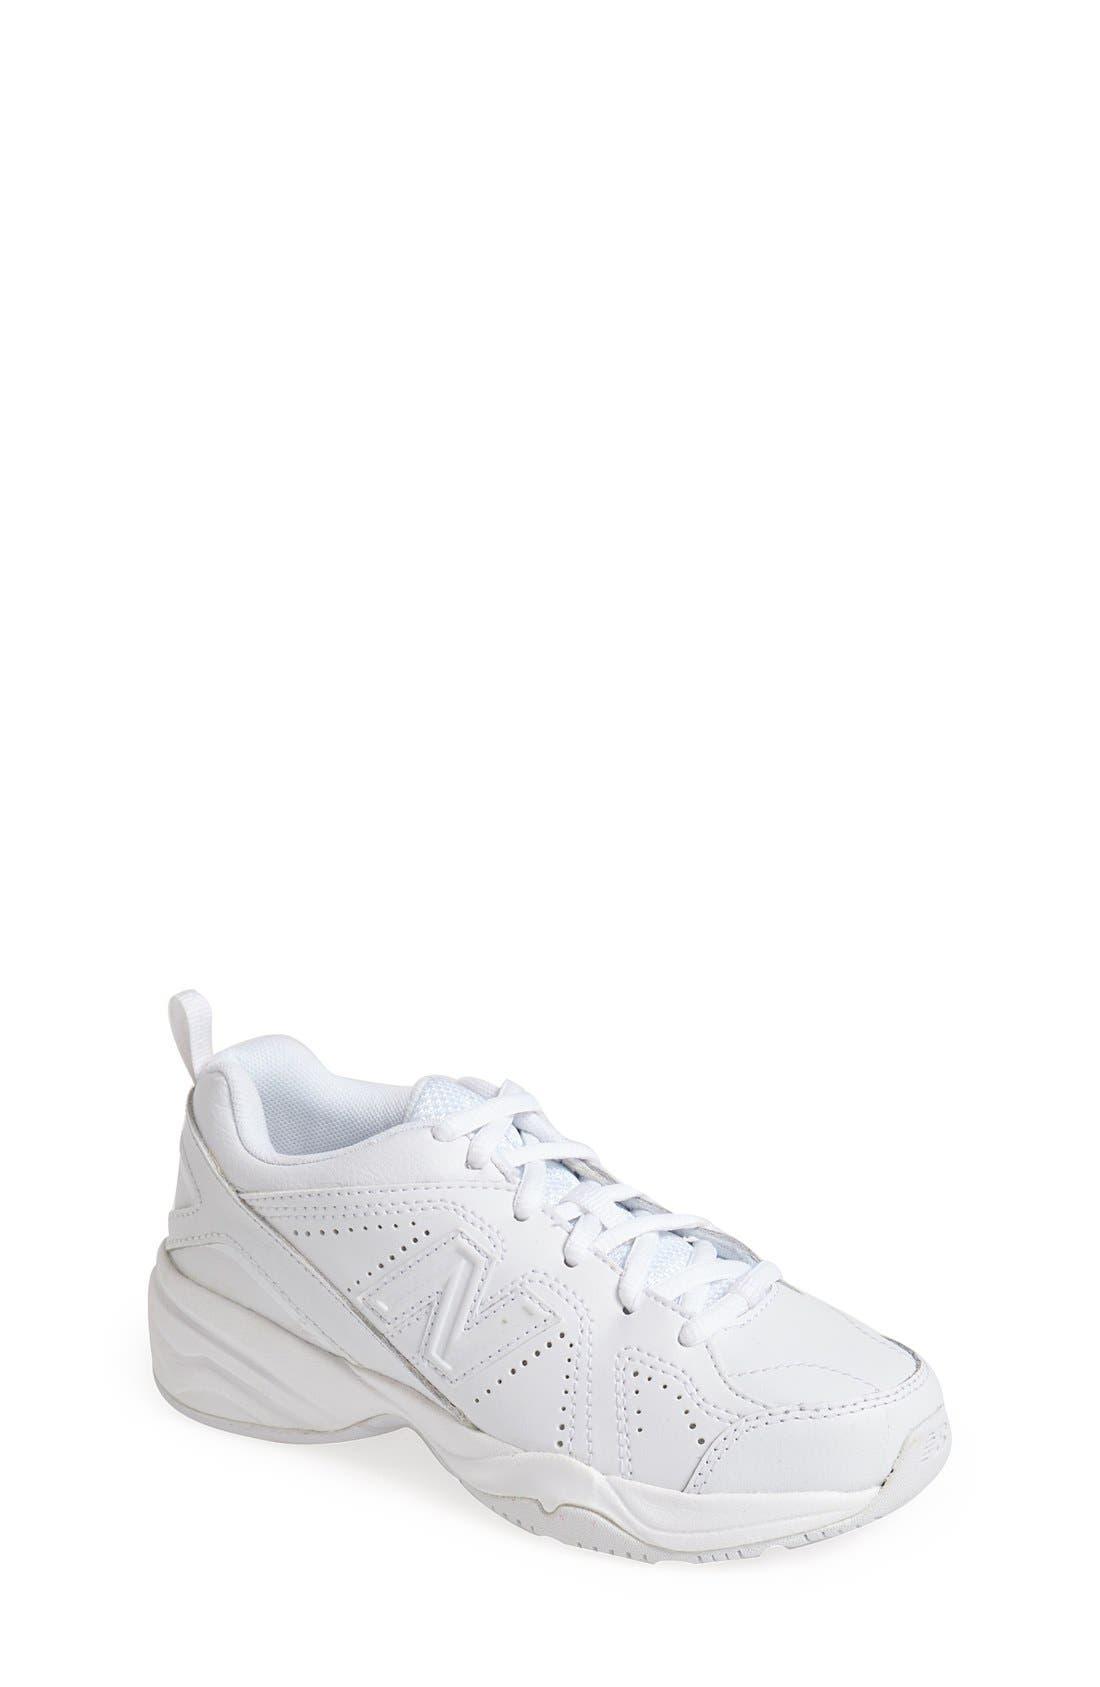 'Takedown 624v2' Sneaker,                             Main thumbnail 1, color,                             White